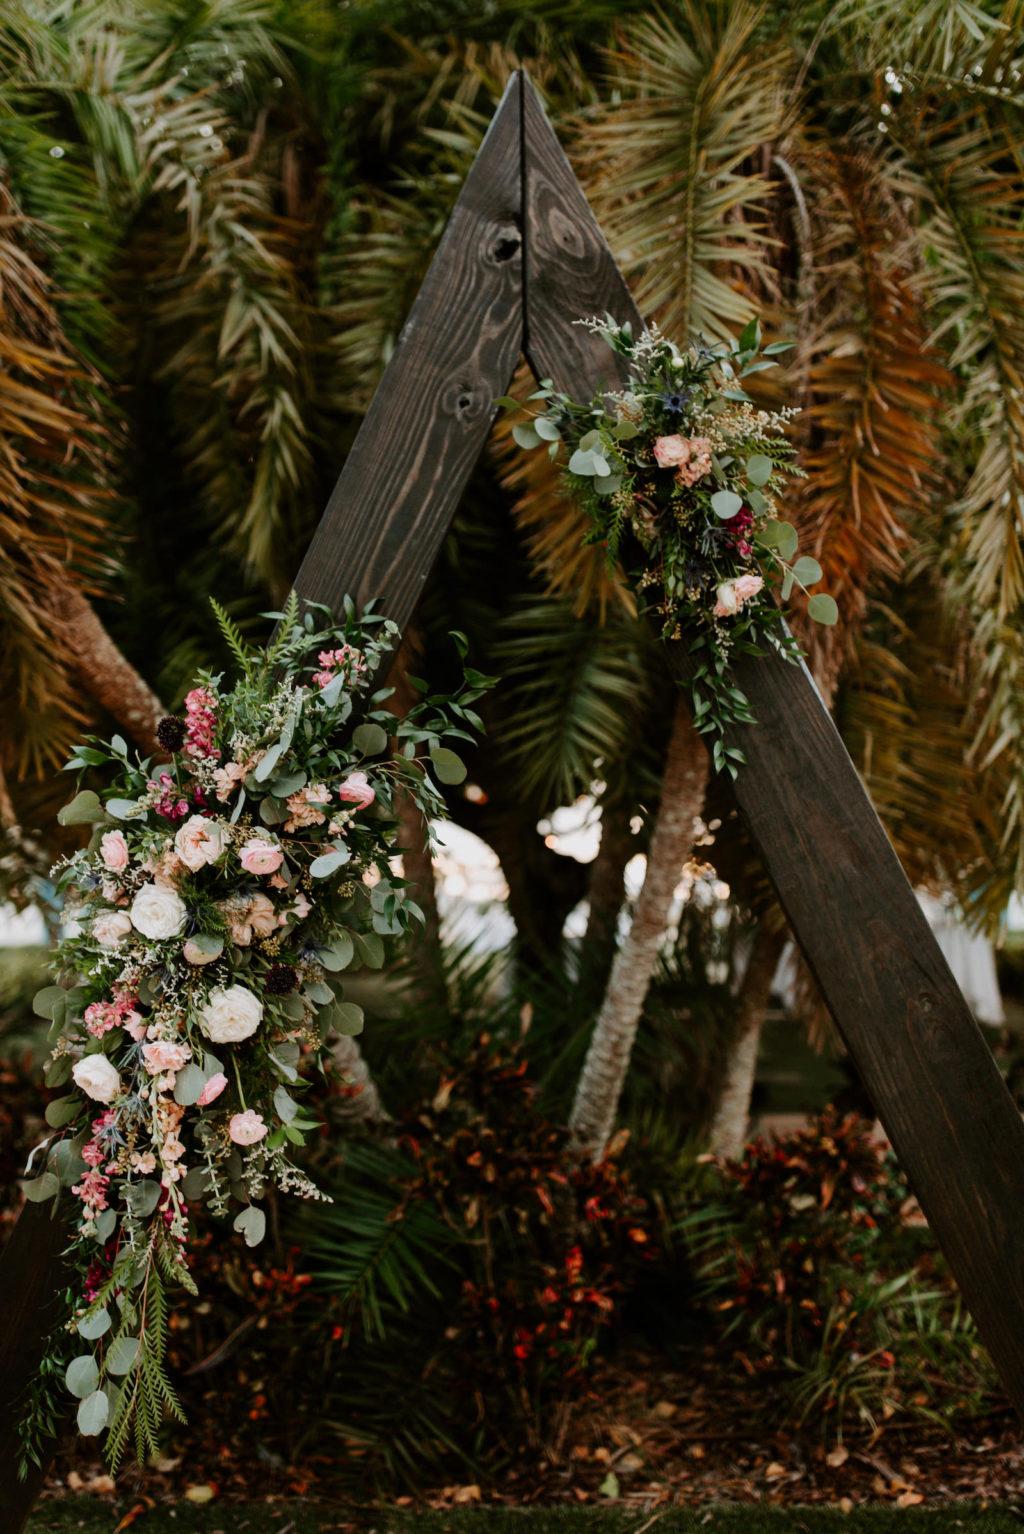 Tropical Boho Garden Wedding Ceremony Decor, Triangular Wooden Arch with Lush Floral Arrangements   St. Pete Wedding Venue Postcard Inn on the Beach